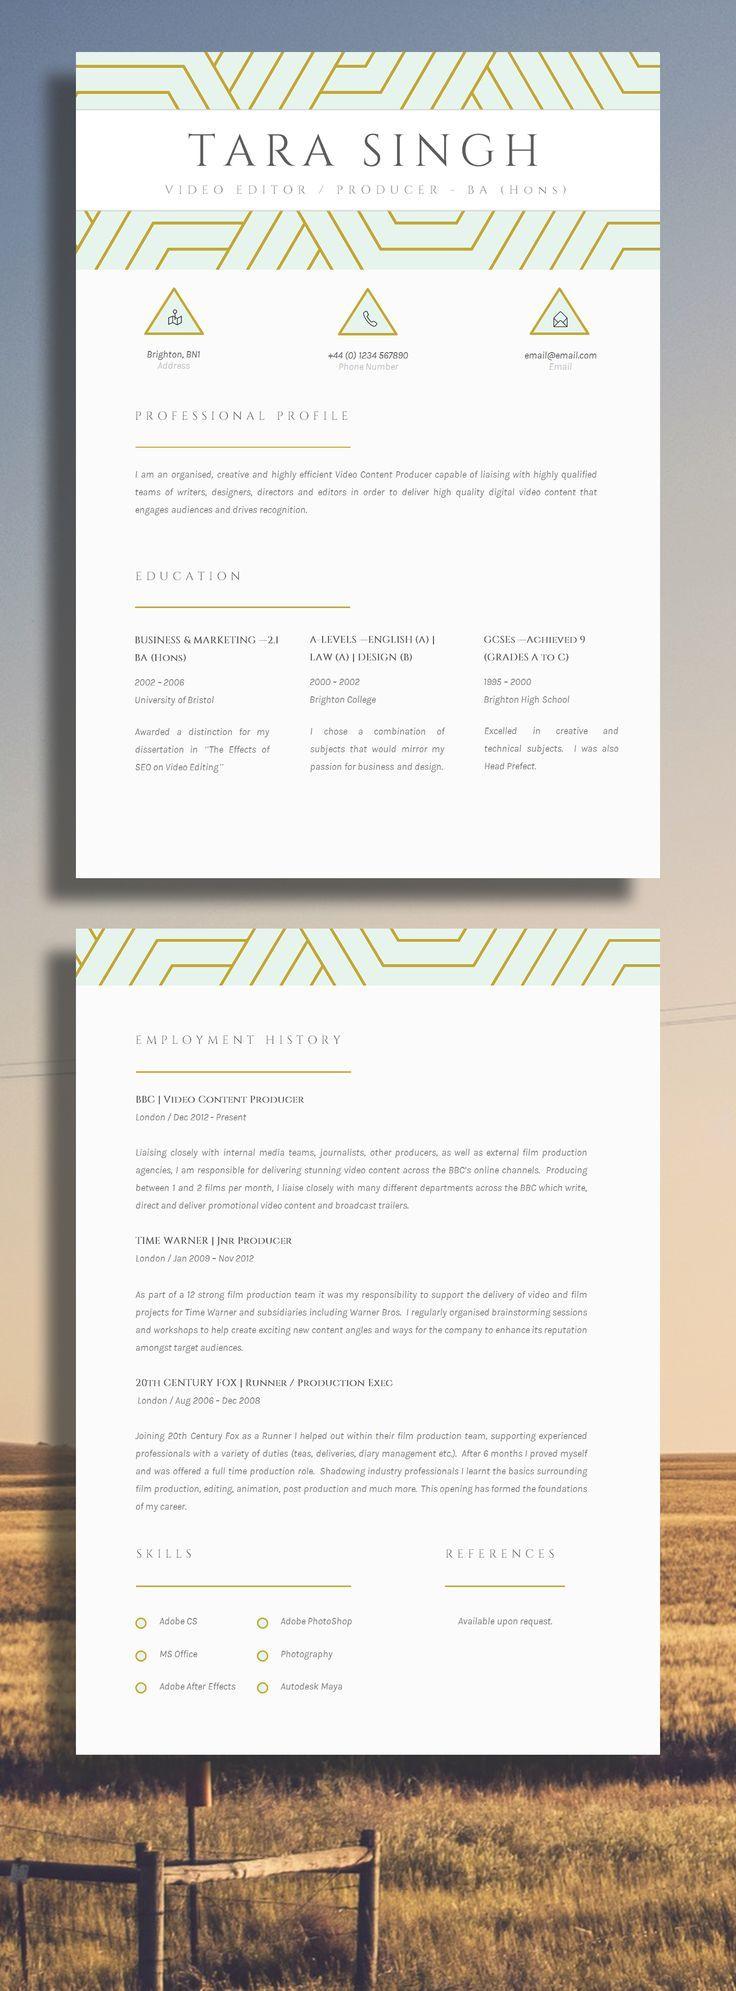 12 best resume cv templates images on pinterest cover letters